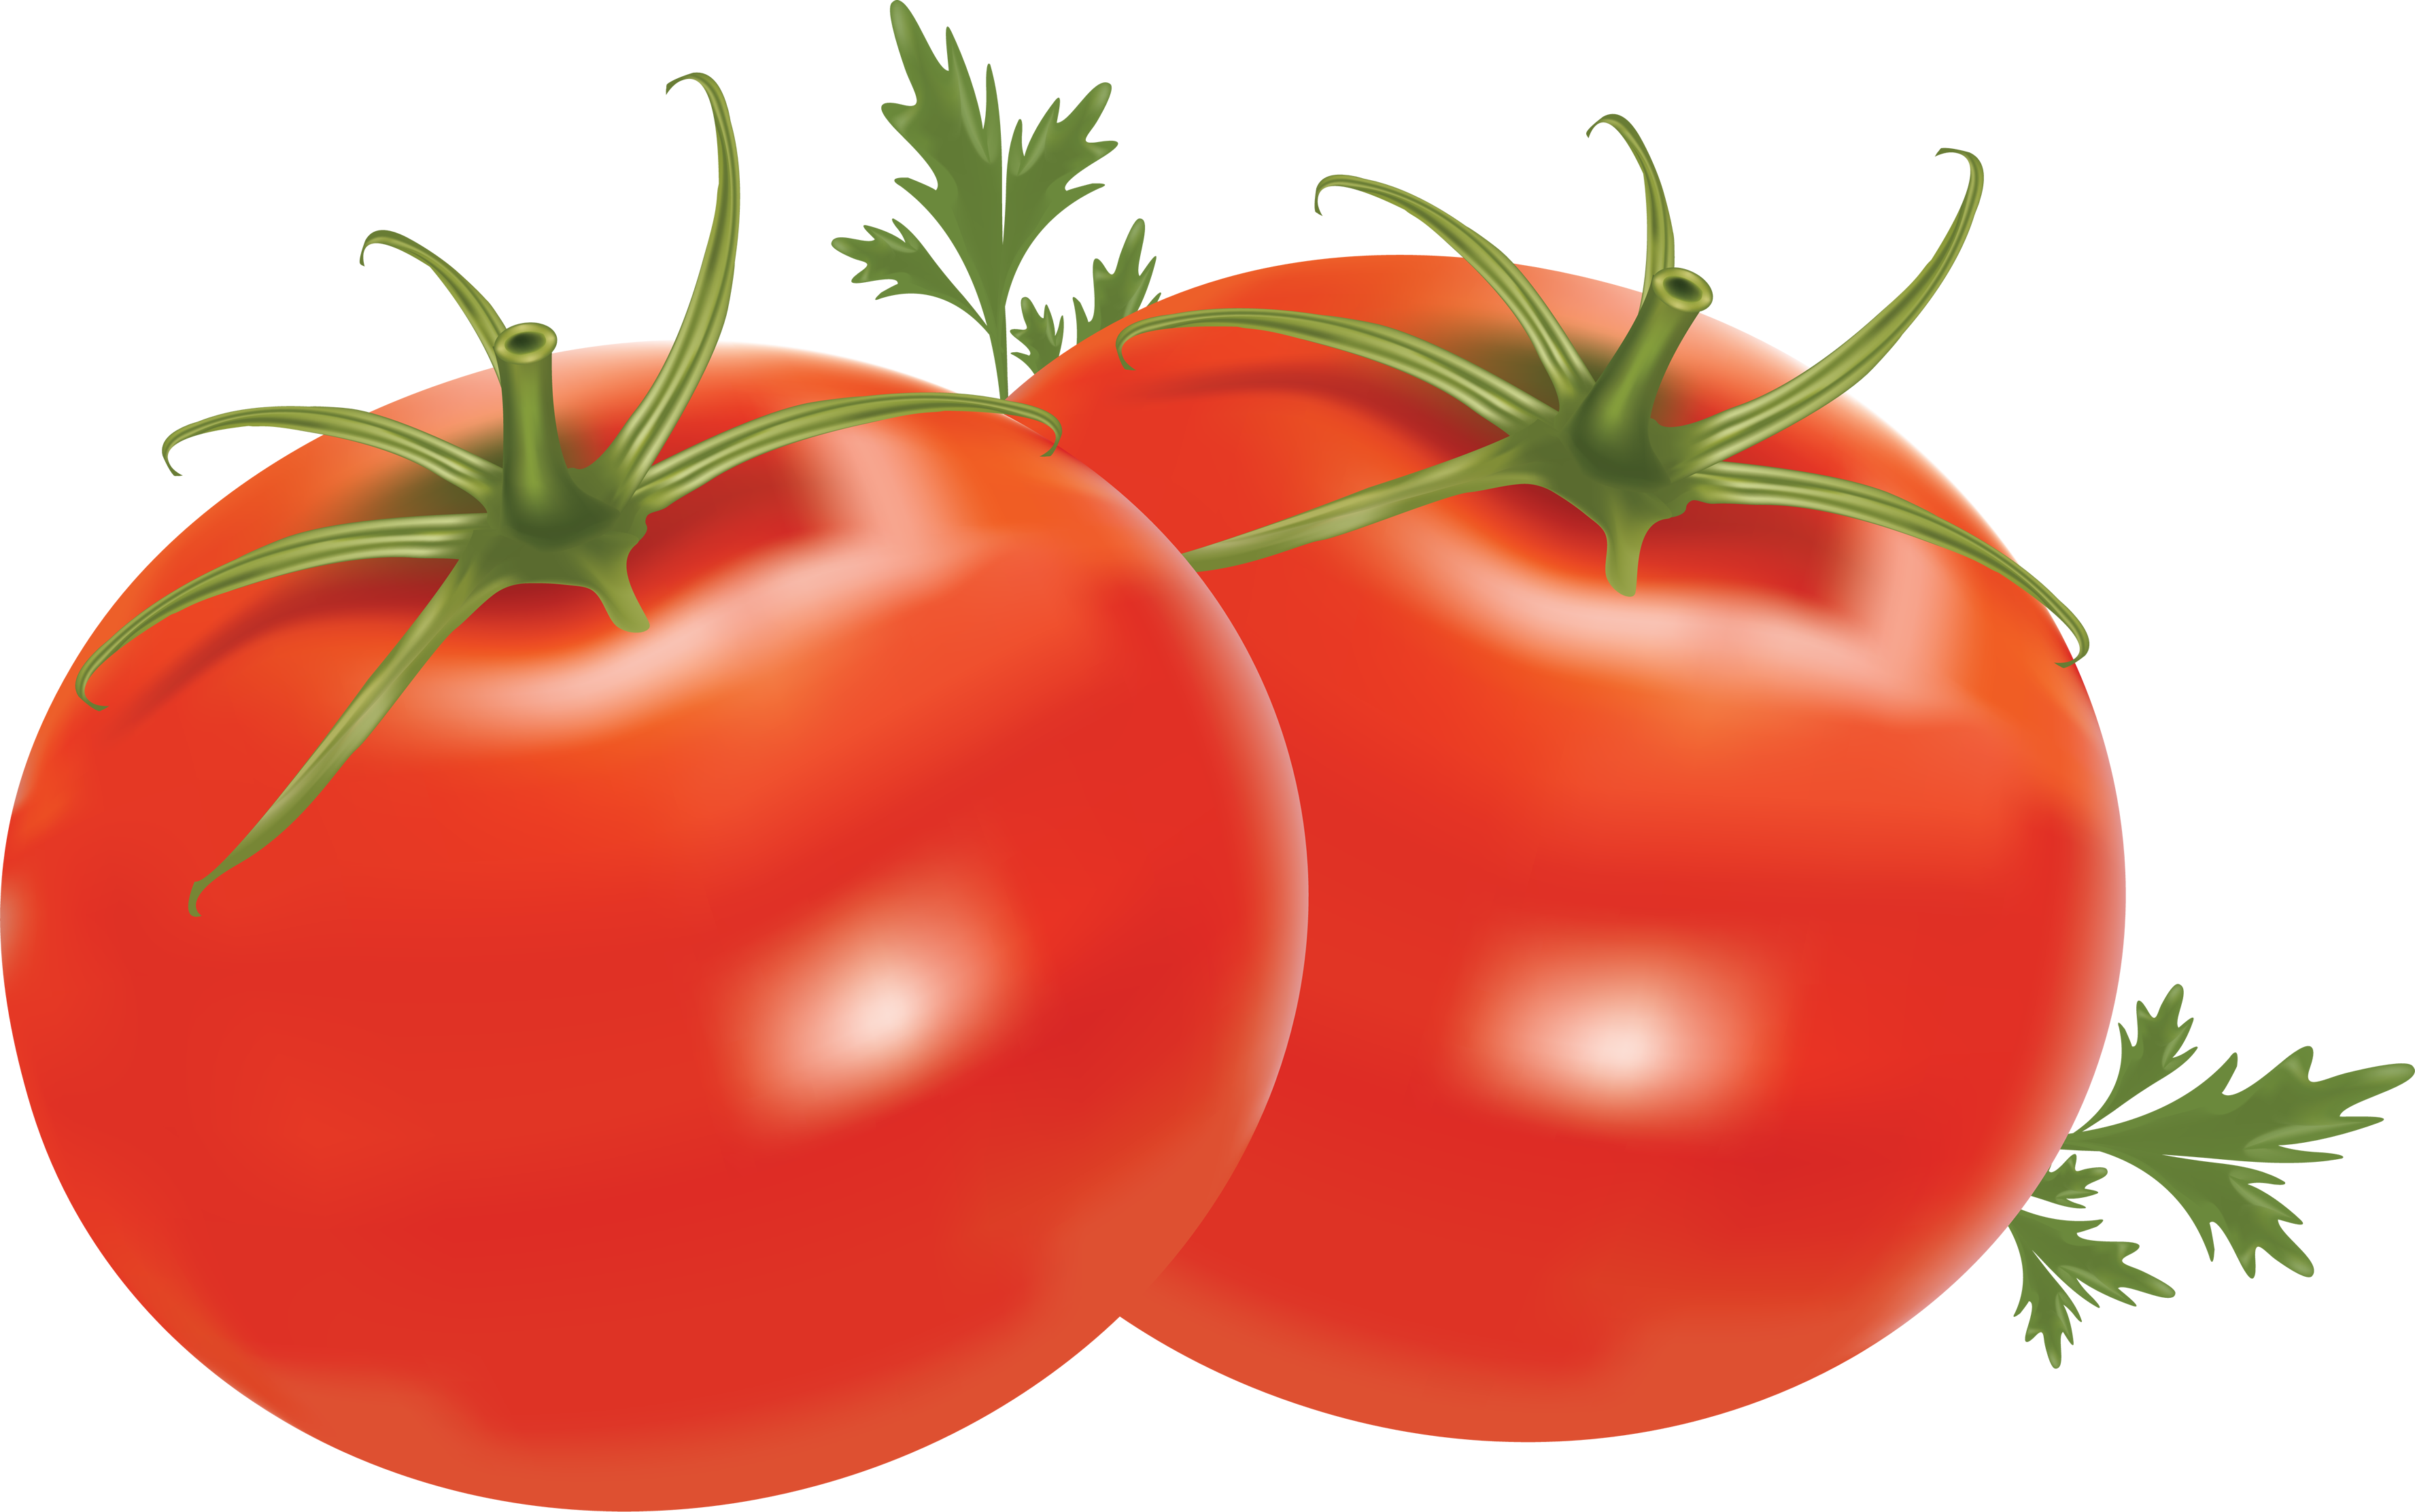 Pear clipart jambu. Tomato png image clip